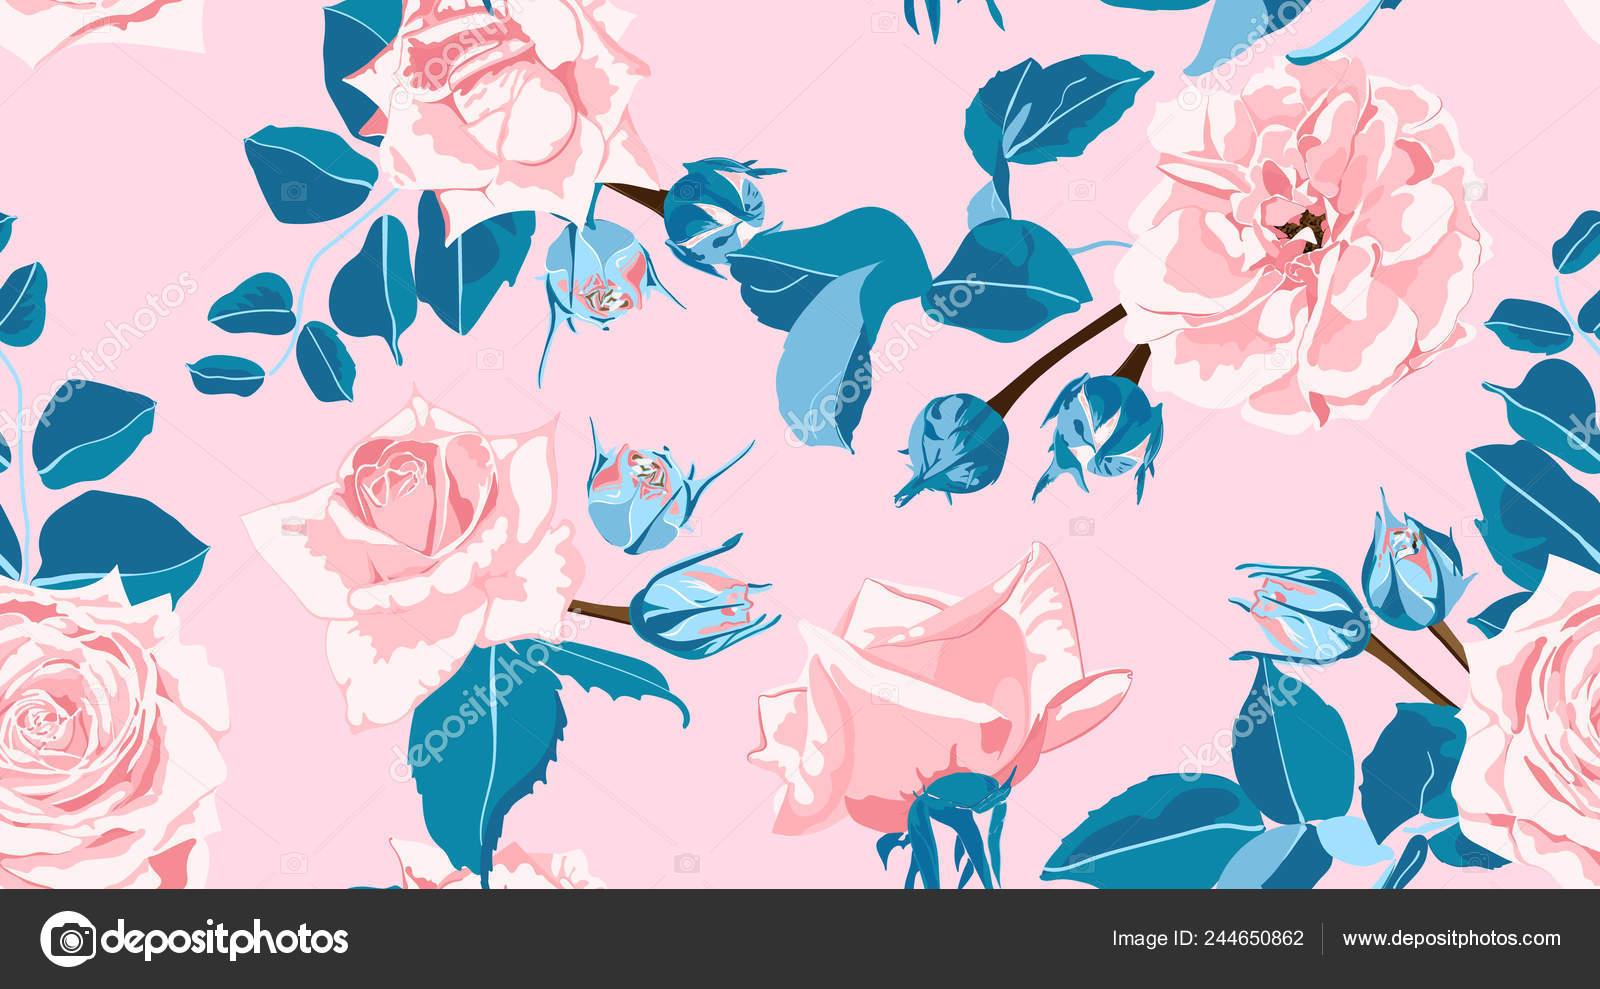 Pastel Floral Pattern Vintage Pink Roses Watercolor Style Wedding